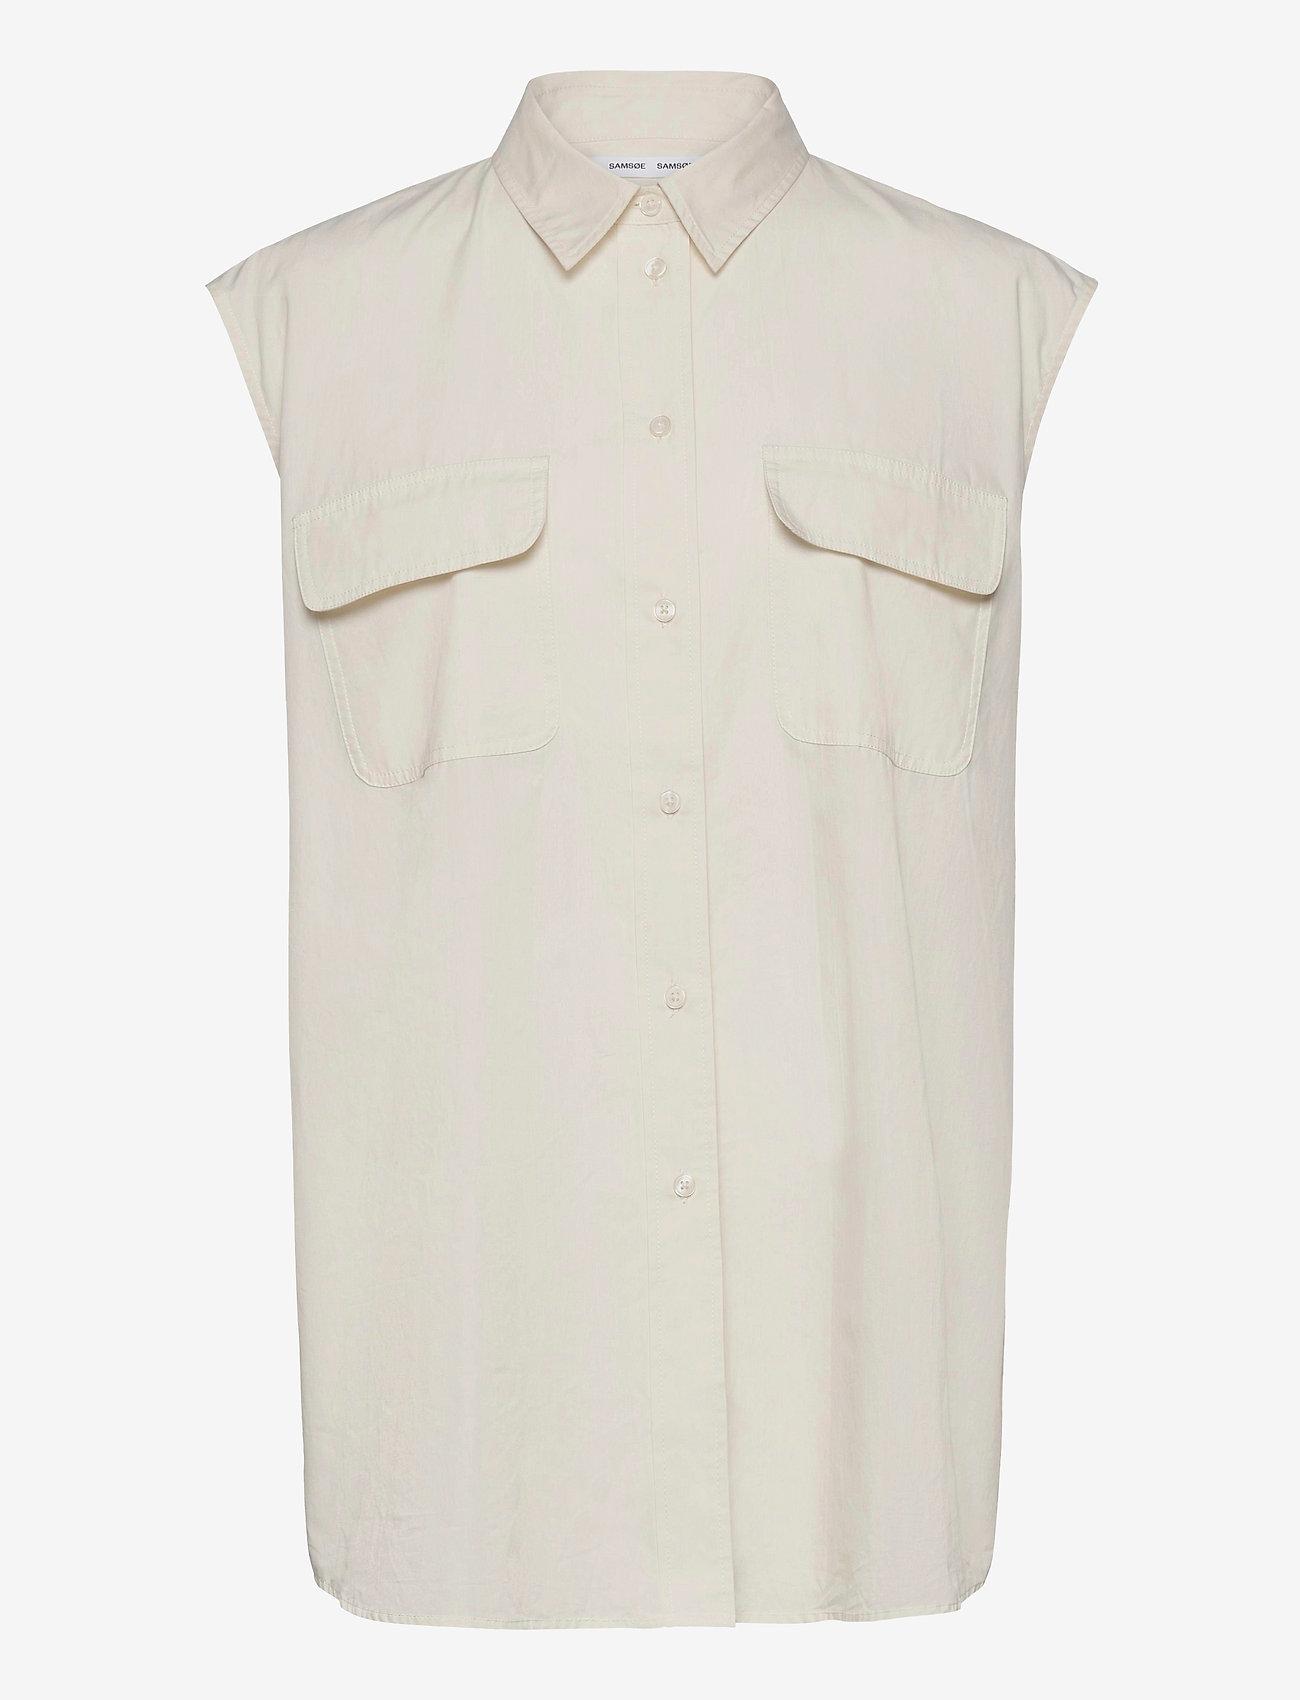 Samsøe Samsøe - Tea shirt top 11466 - denim shirts - antique white - 1